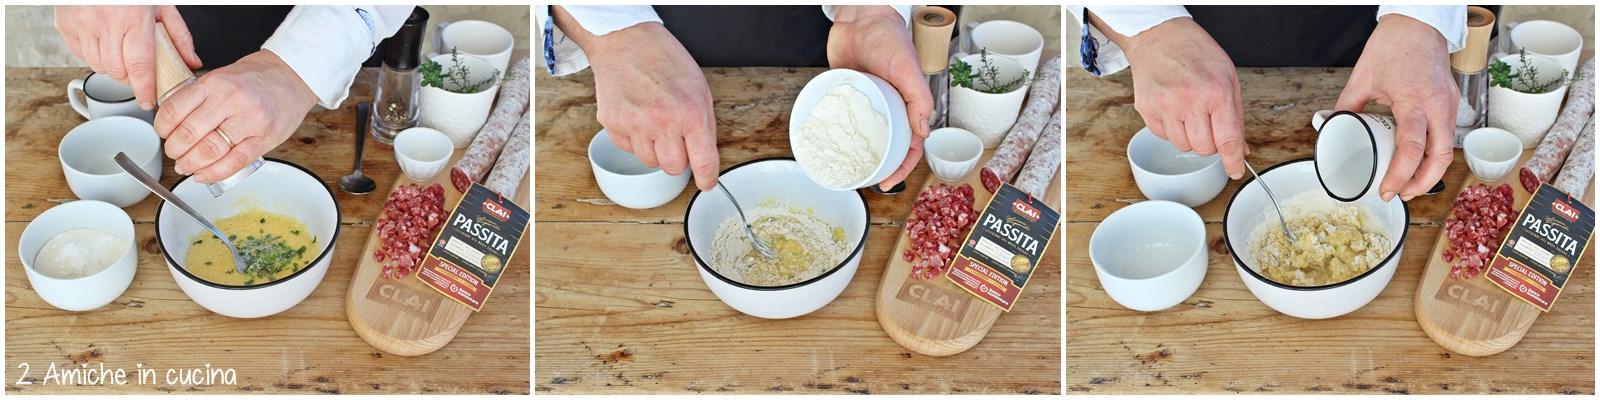 Mug cake salata, ricetta facile e veloce